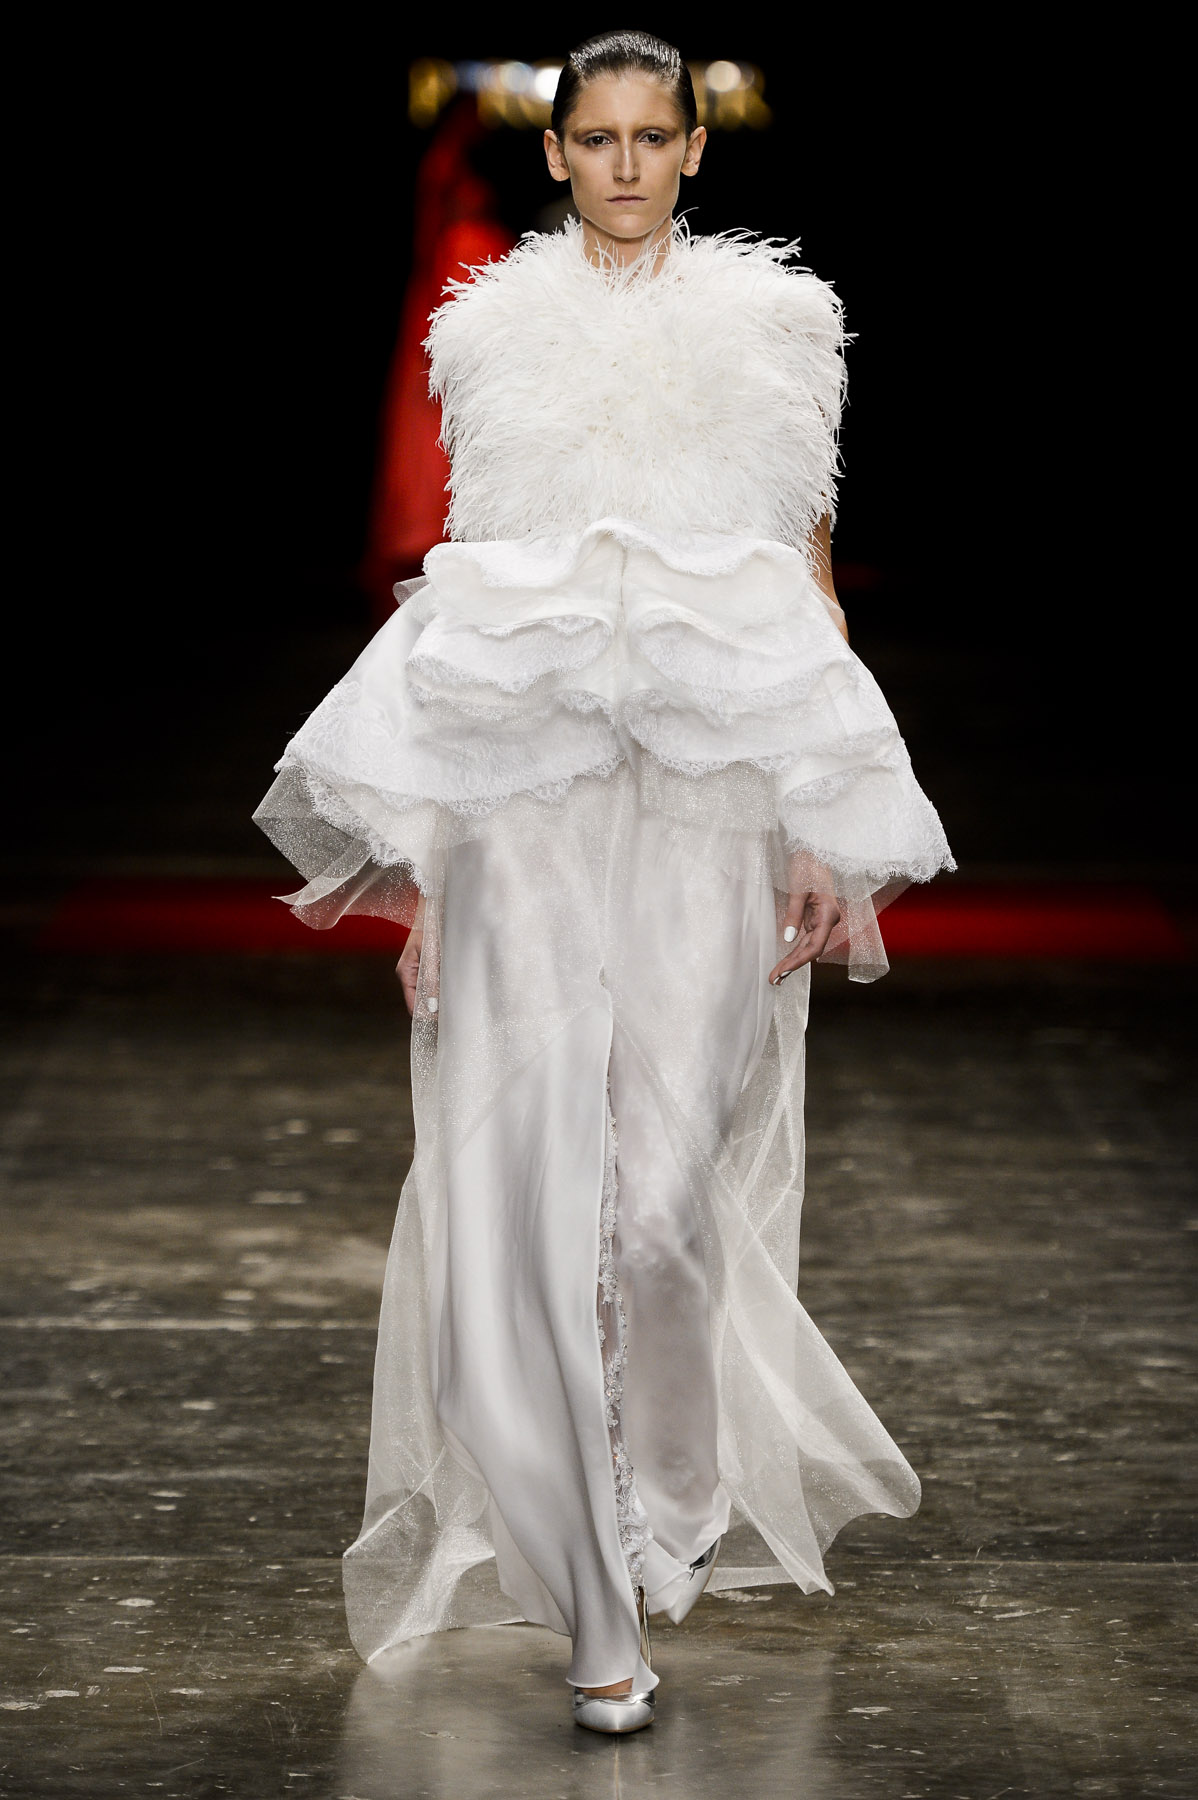 Sao Paulo Fashion Week S/S 2013-2014: R.Rosner